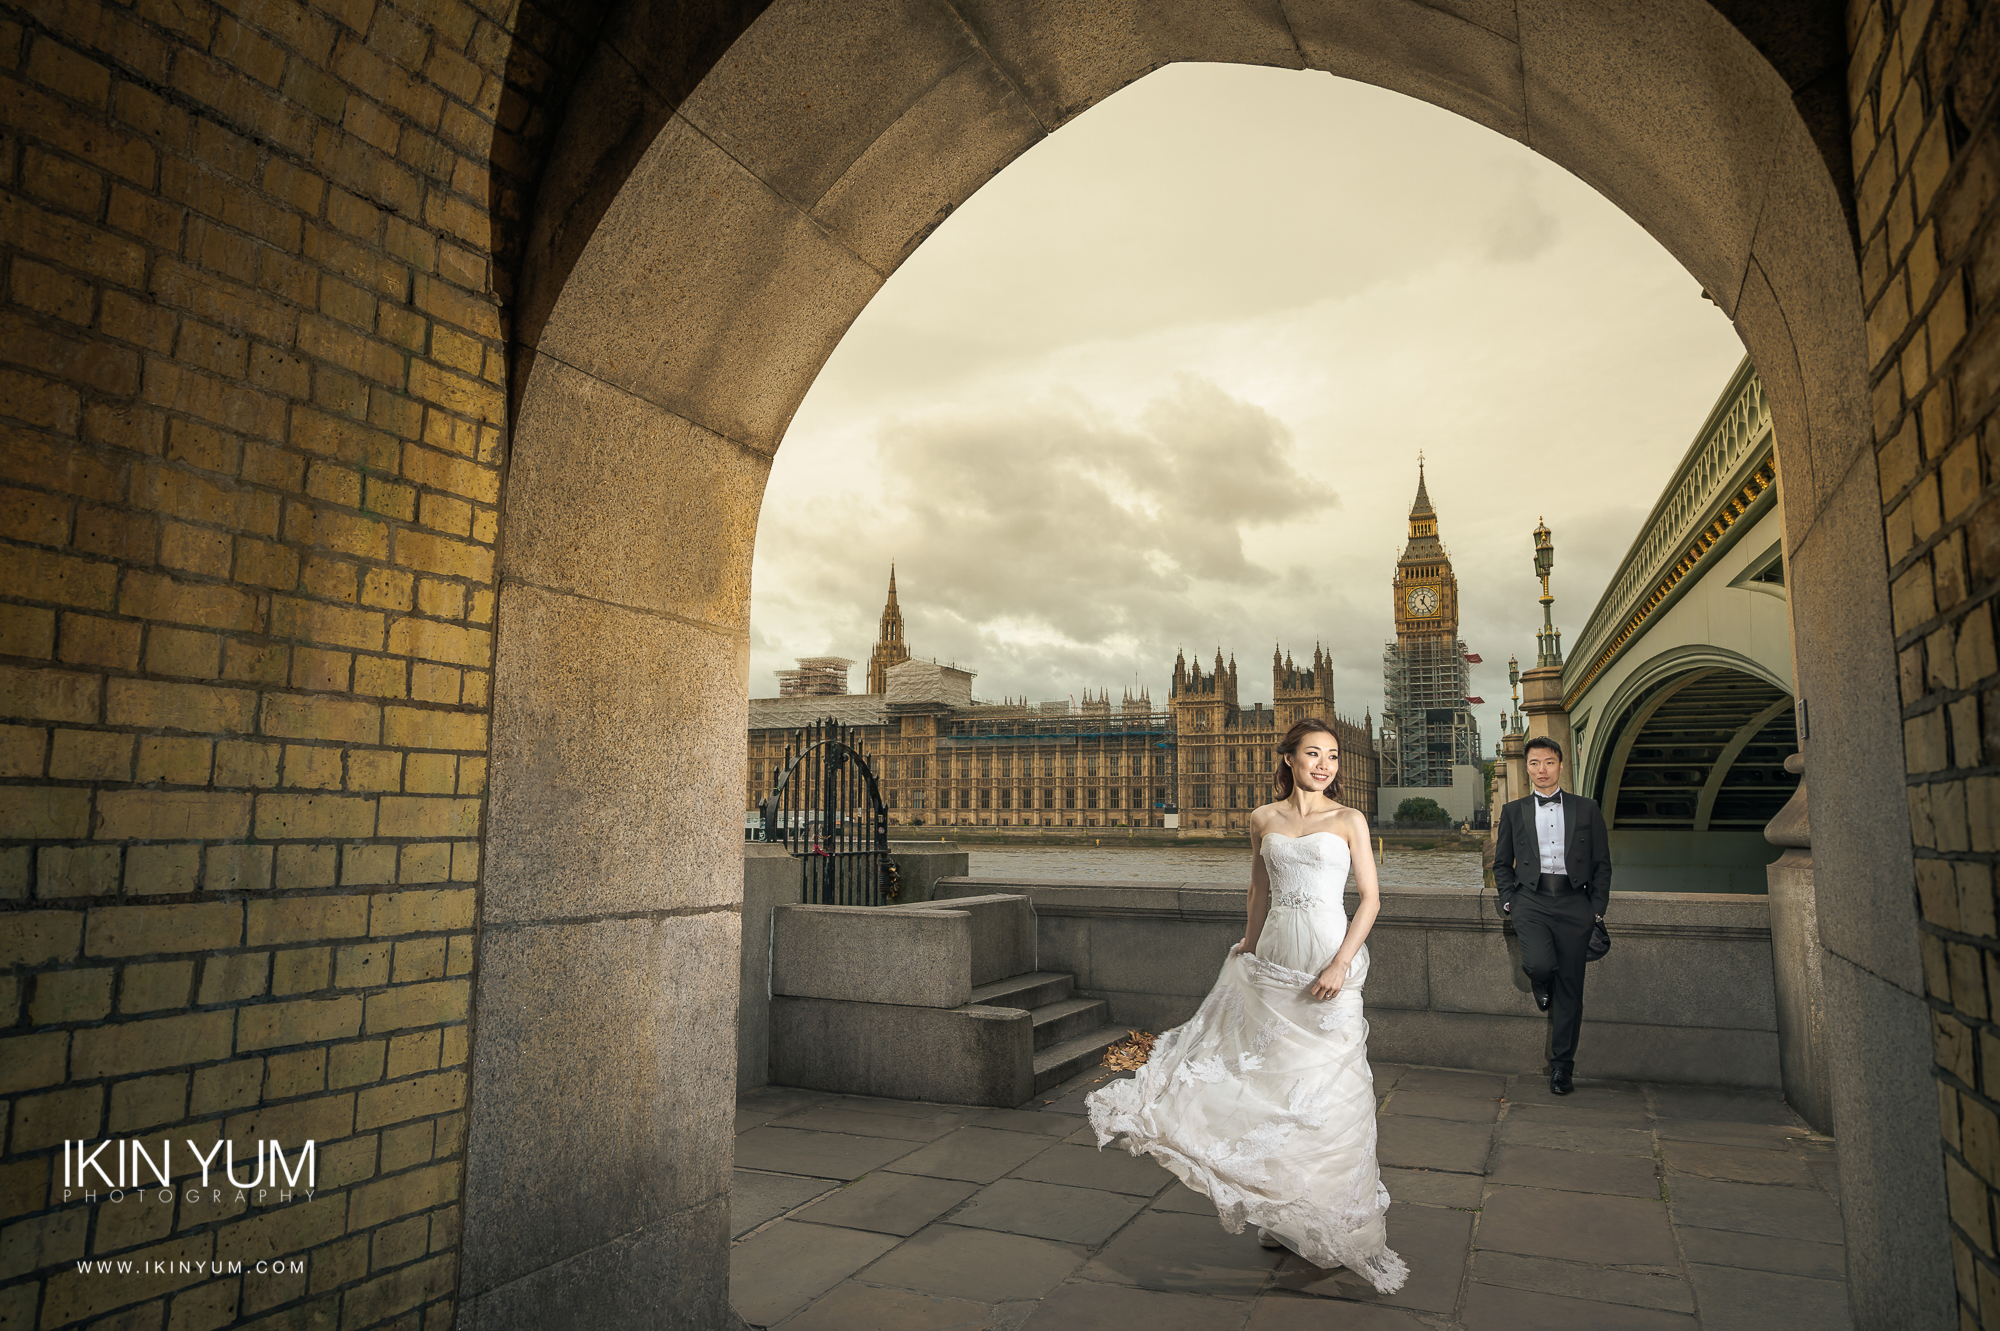 London Pre-Wedding Shoot- UK Pre-Wedding Photographer- 英国伦敦婚纱摄影